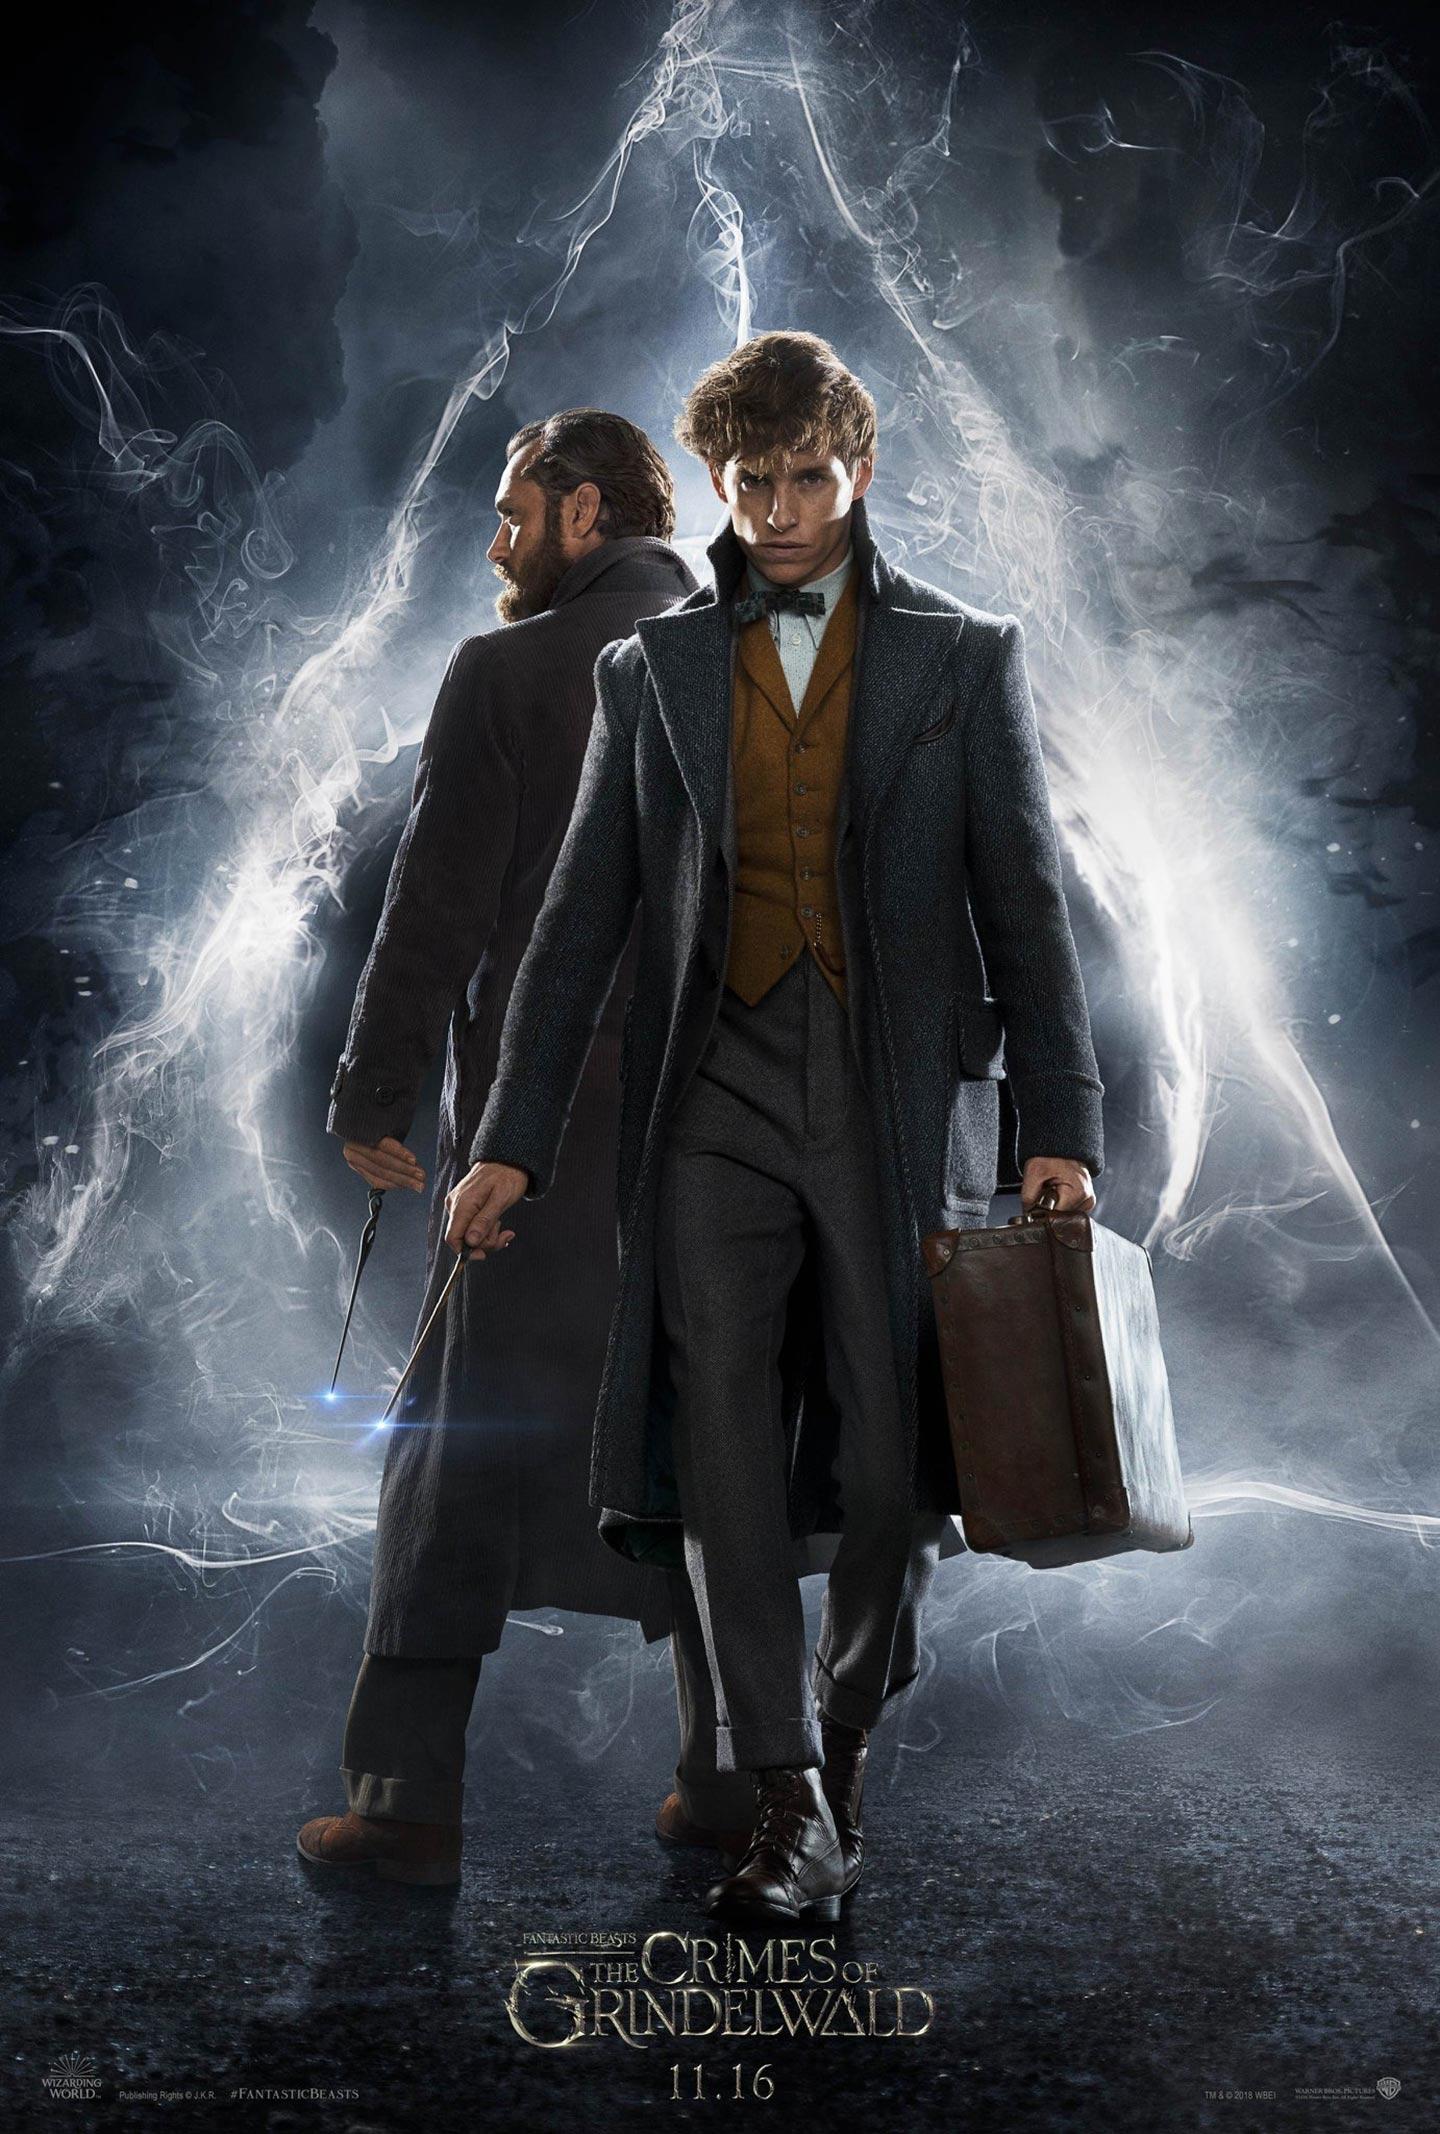 Fantastic Beasts: The Crimes of Grindelwald Poster #2